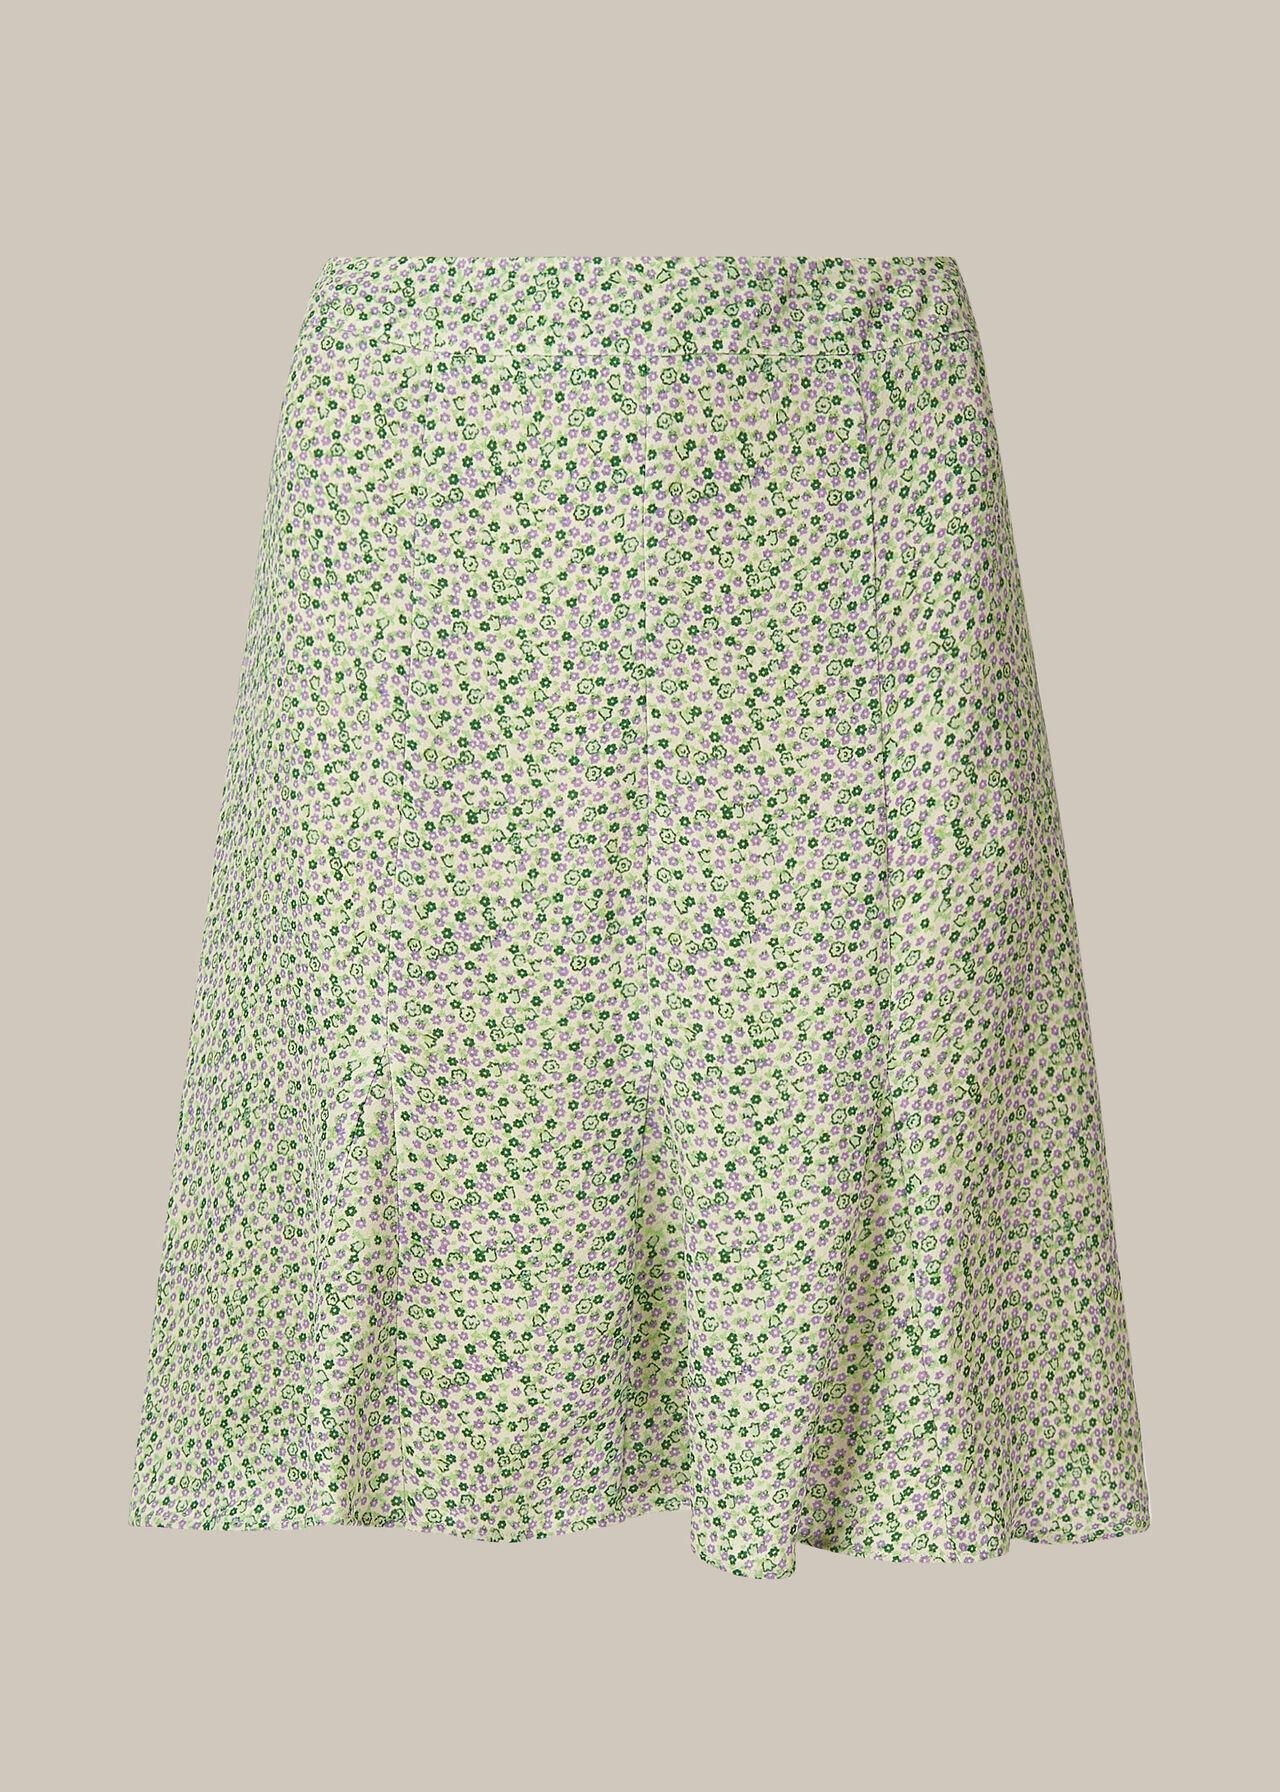 English Garden Flippy Skirt Green/Multi